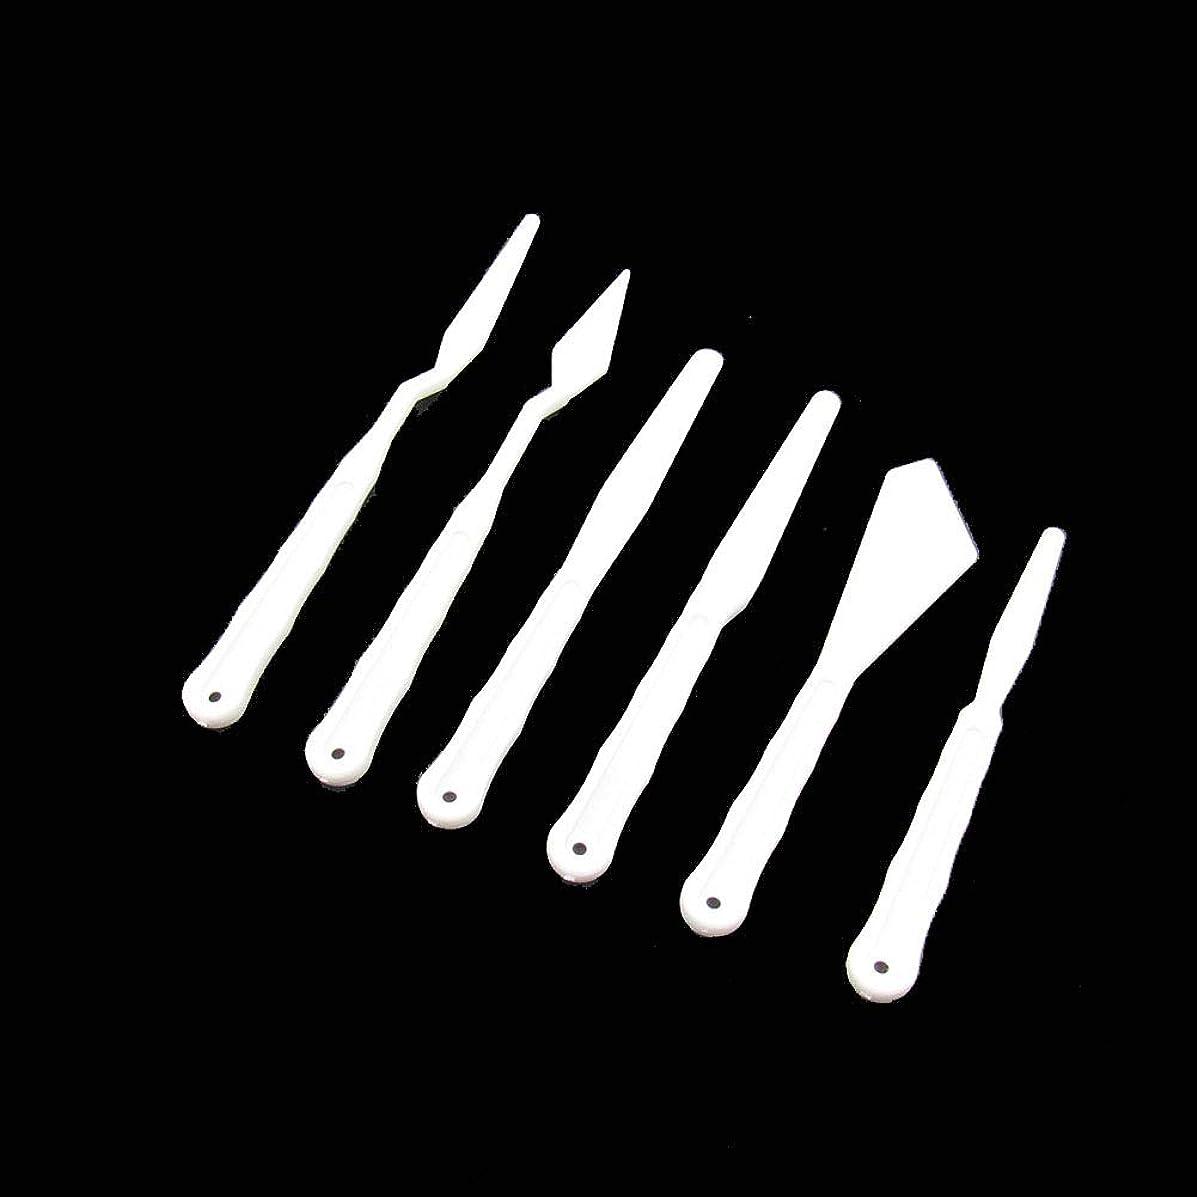 18 Pcs Plastic Spatula Palette Knives Set,Mixing Scraper Set,Flexible Art Tools for Artist Oil Painting,